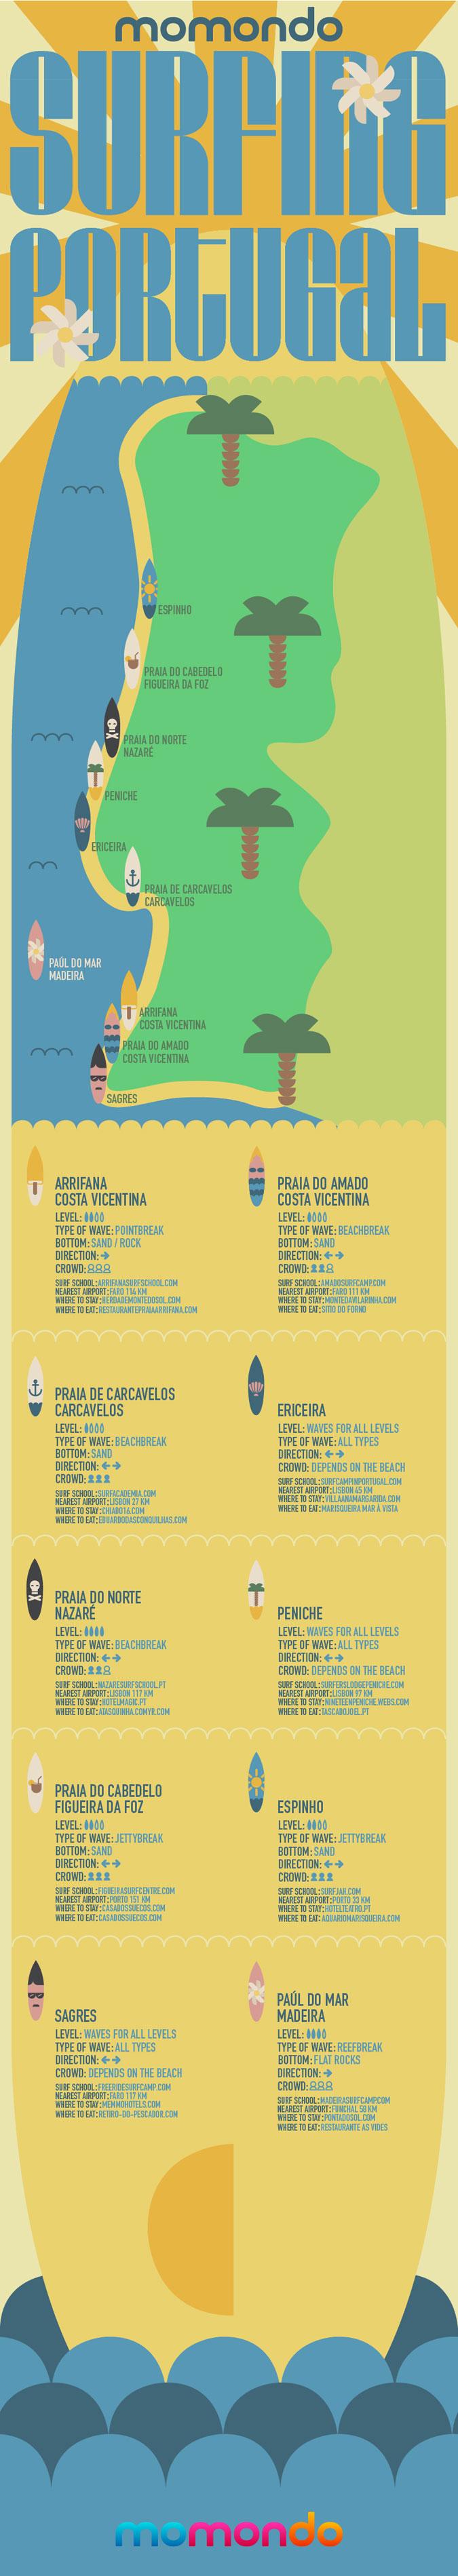 10-unmissable-spots-that-make-portugal-a-surfer-s-12